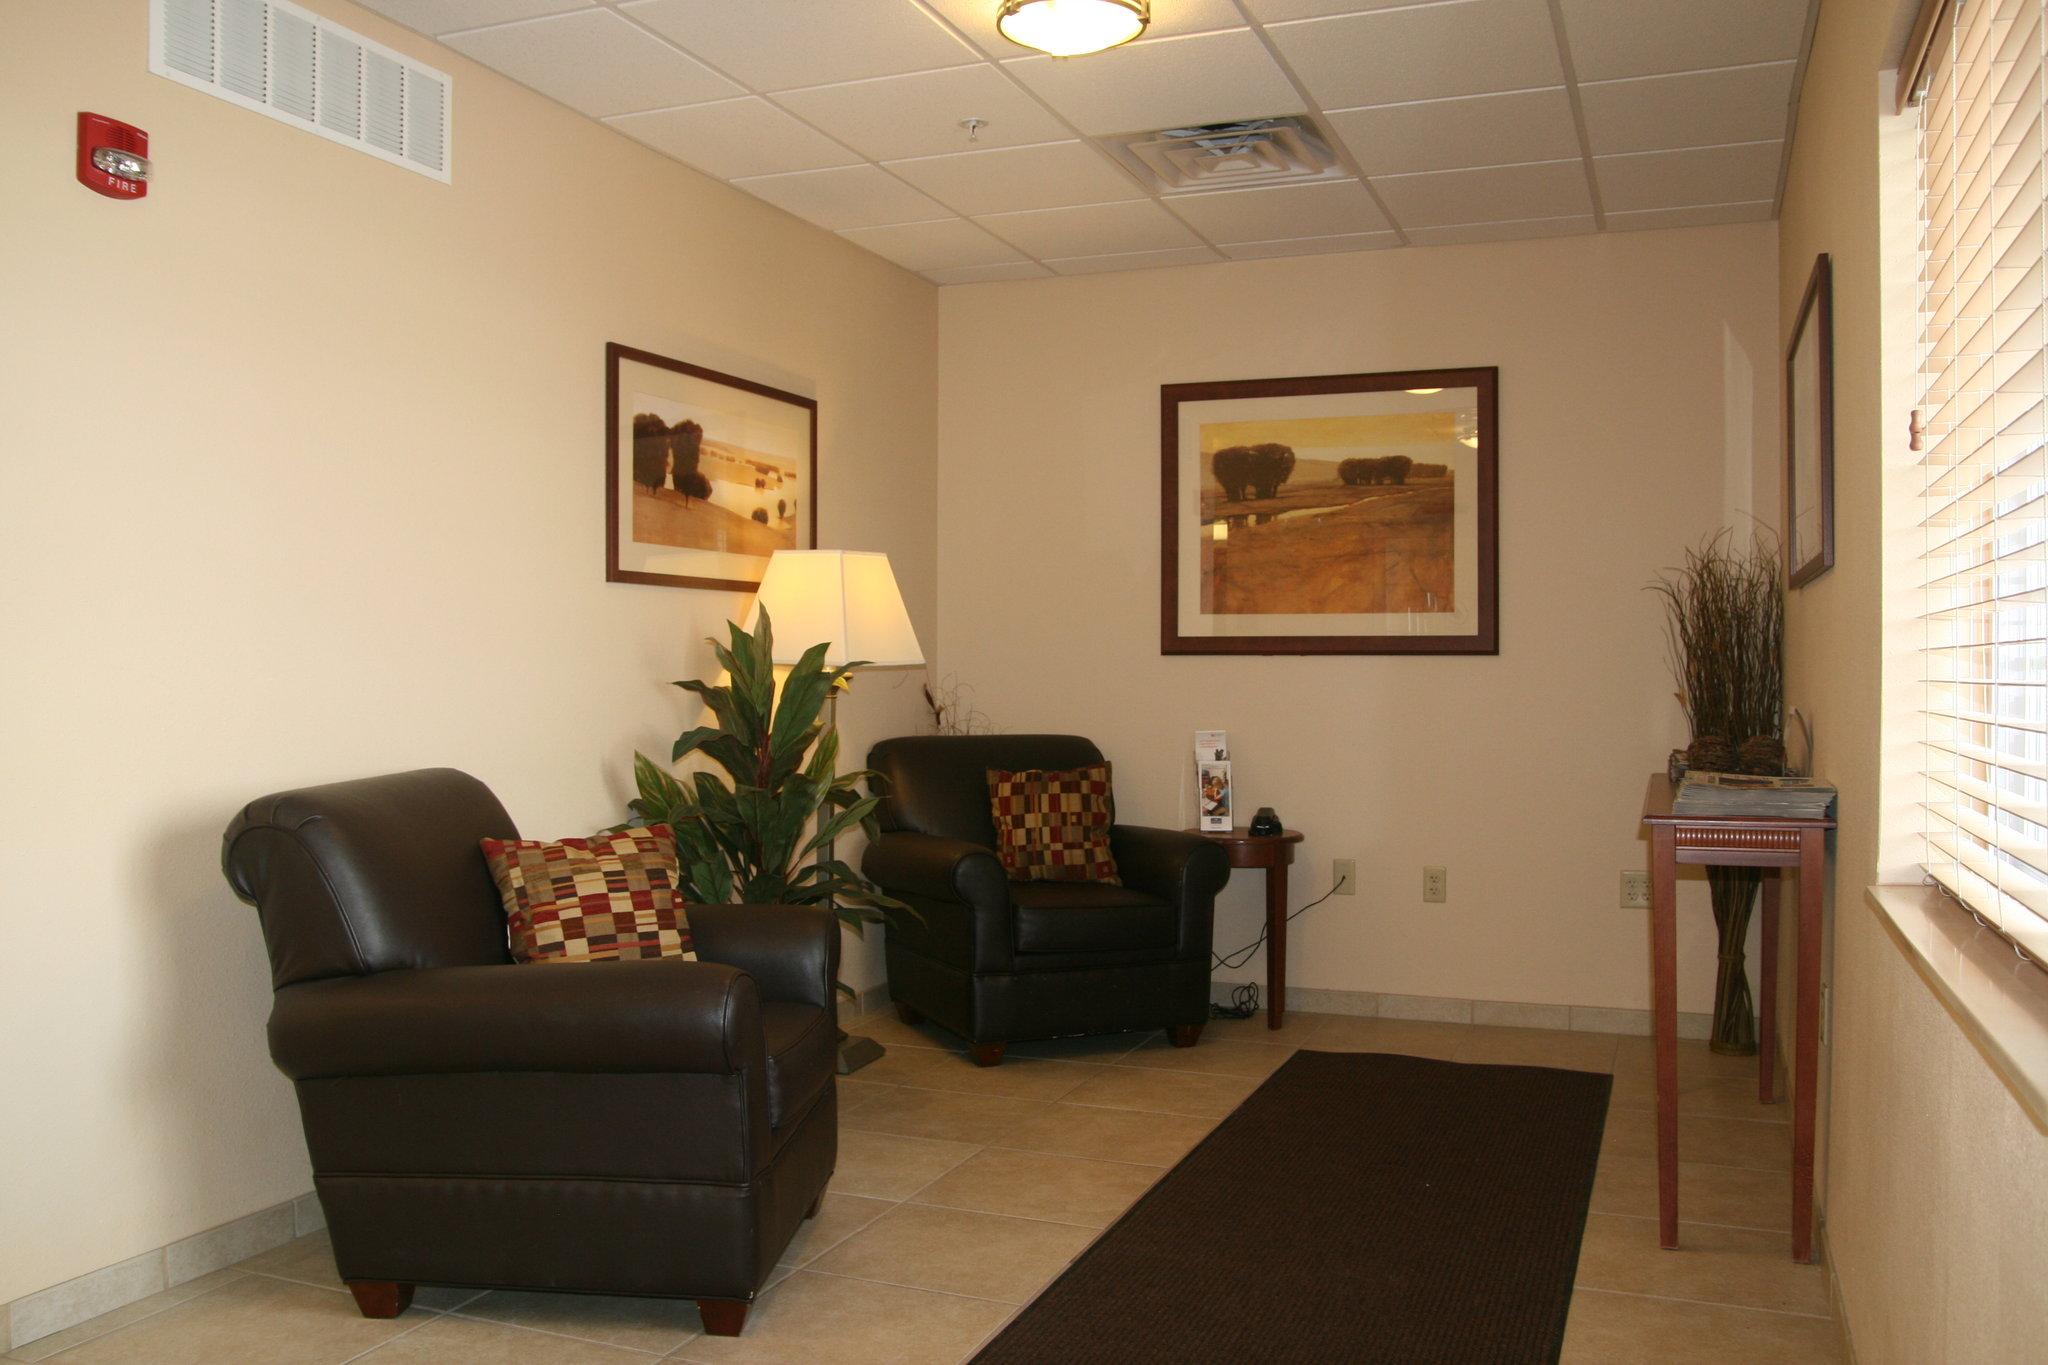 Candlewood Suites at Grand Prairie